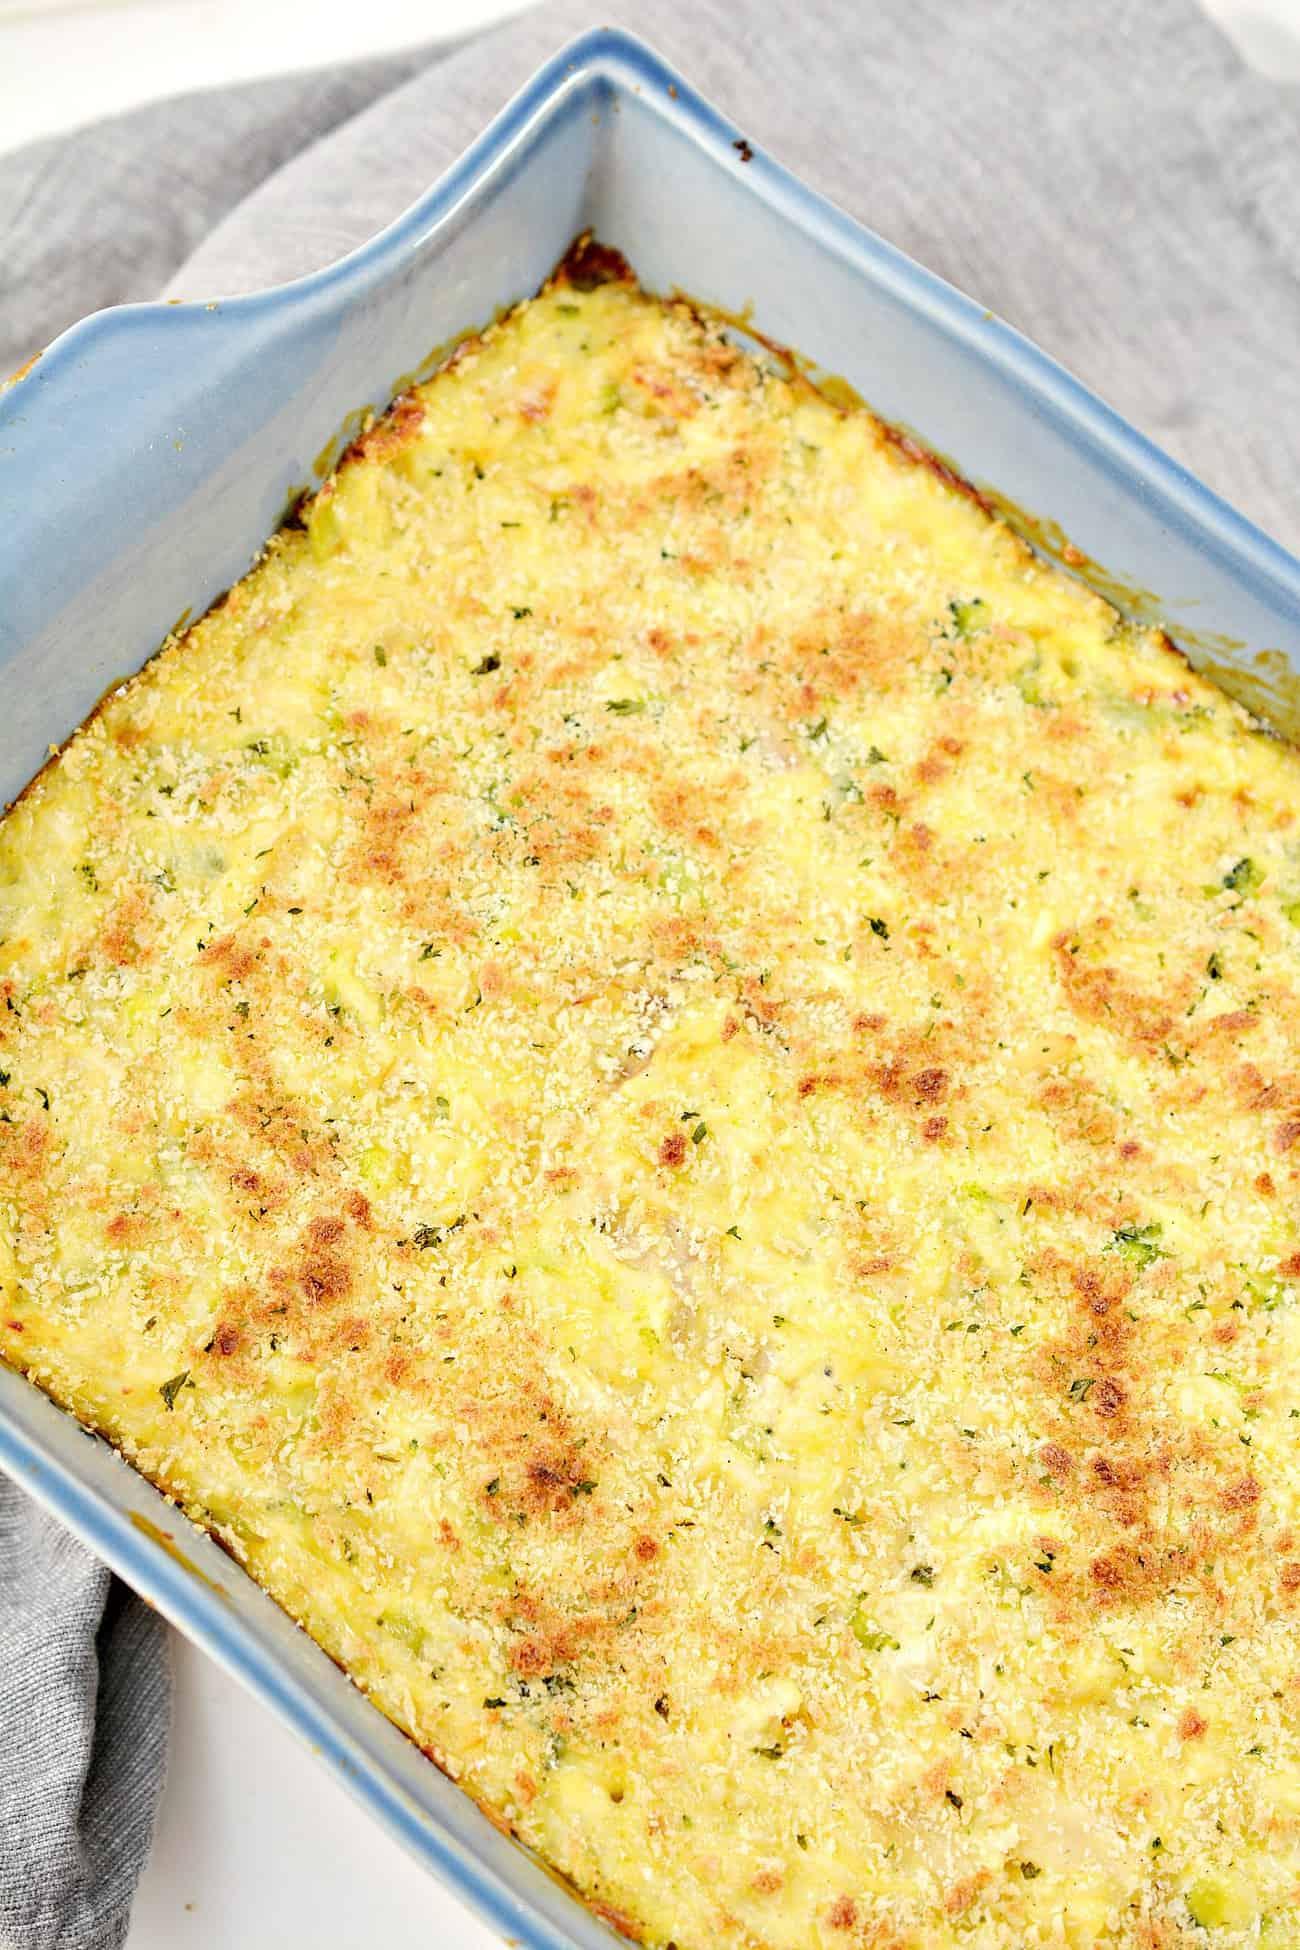 Broccoli, Rice, Chicken and Cheese Casserole